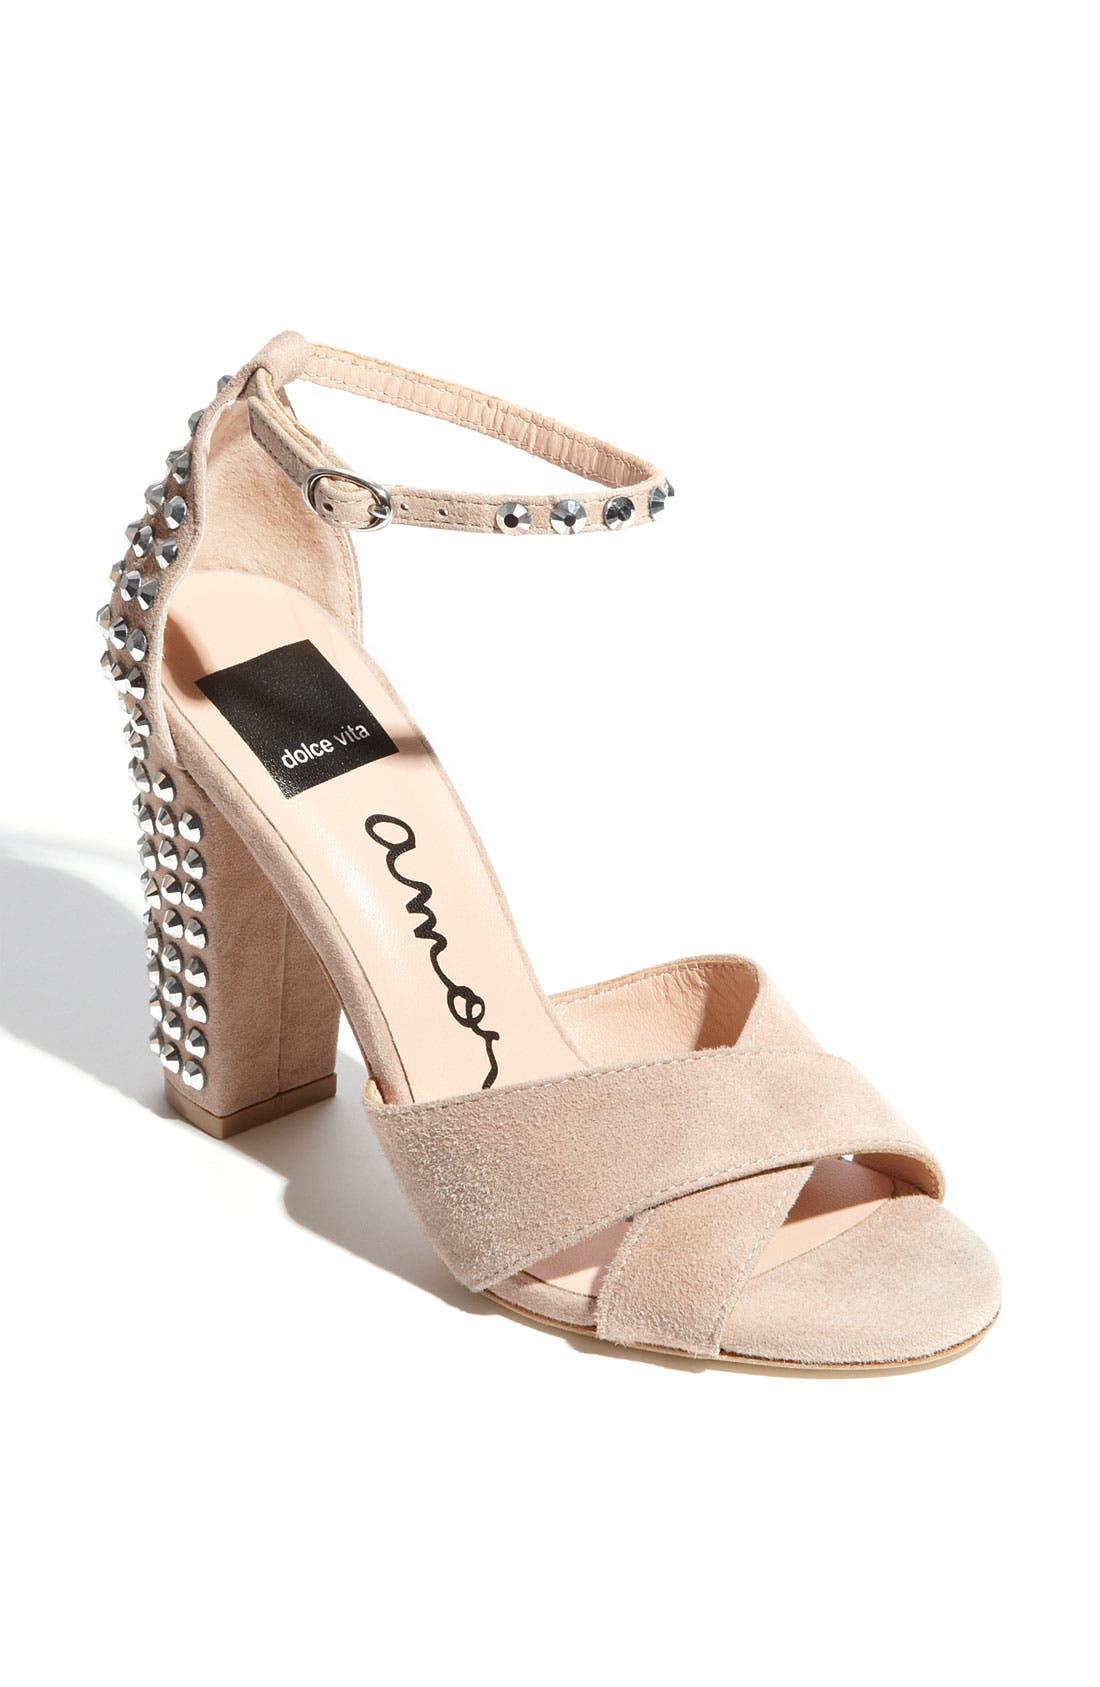 Alternate Image 1 Selected - Dolce Vita 'Kitz' Sandal